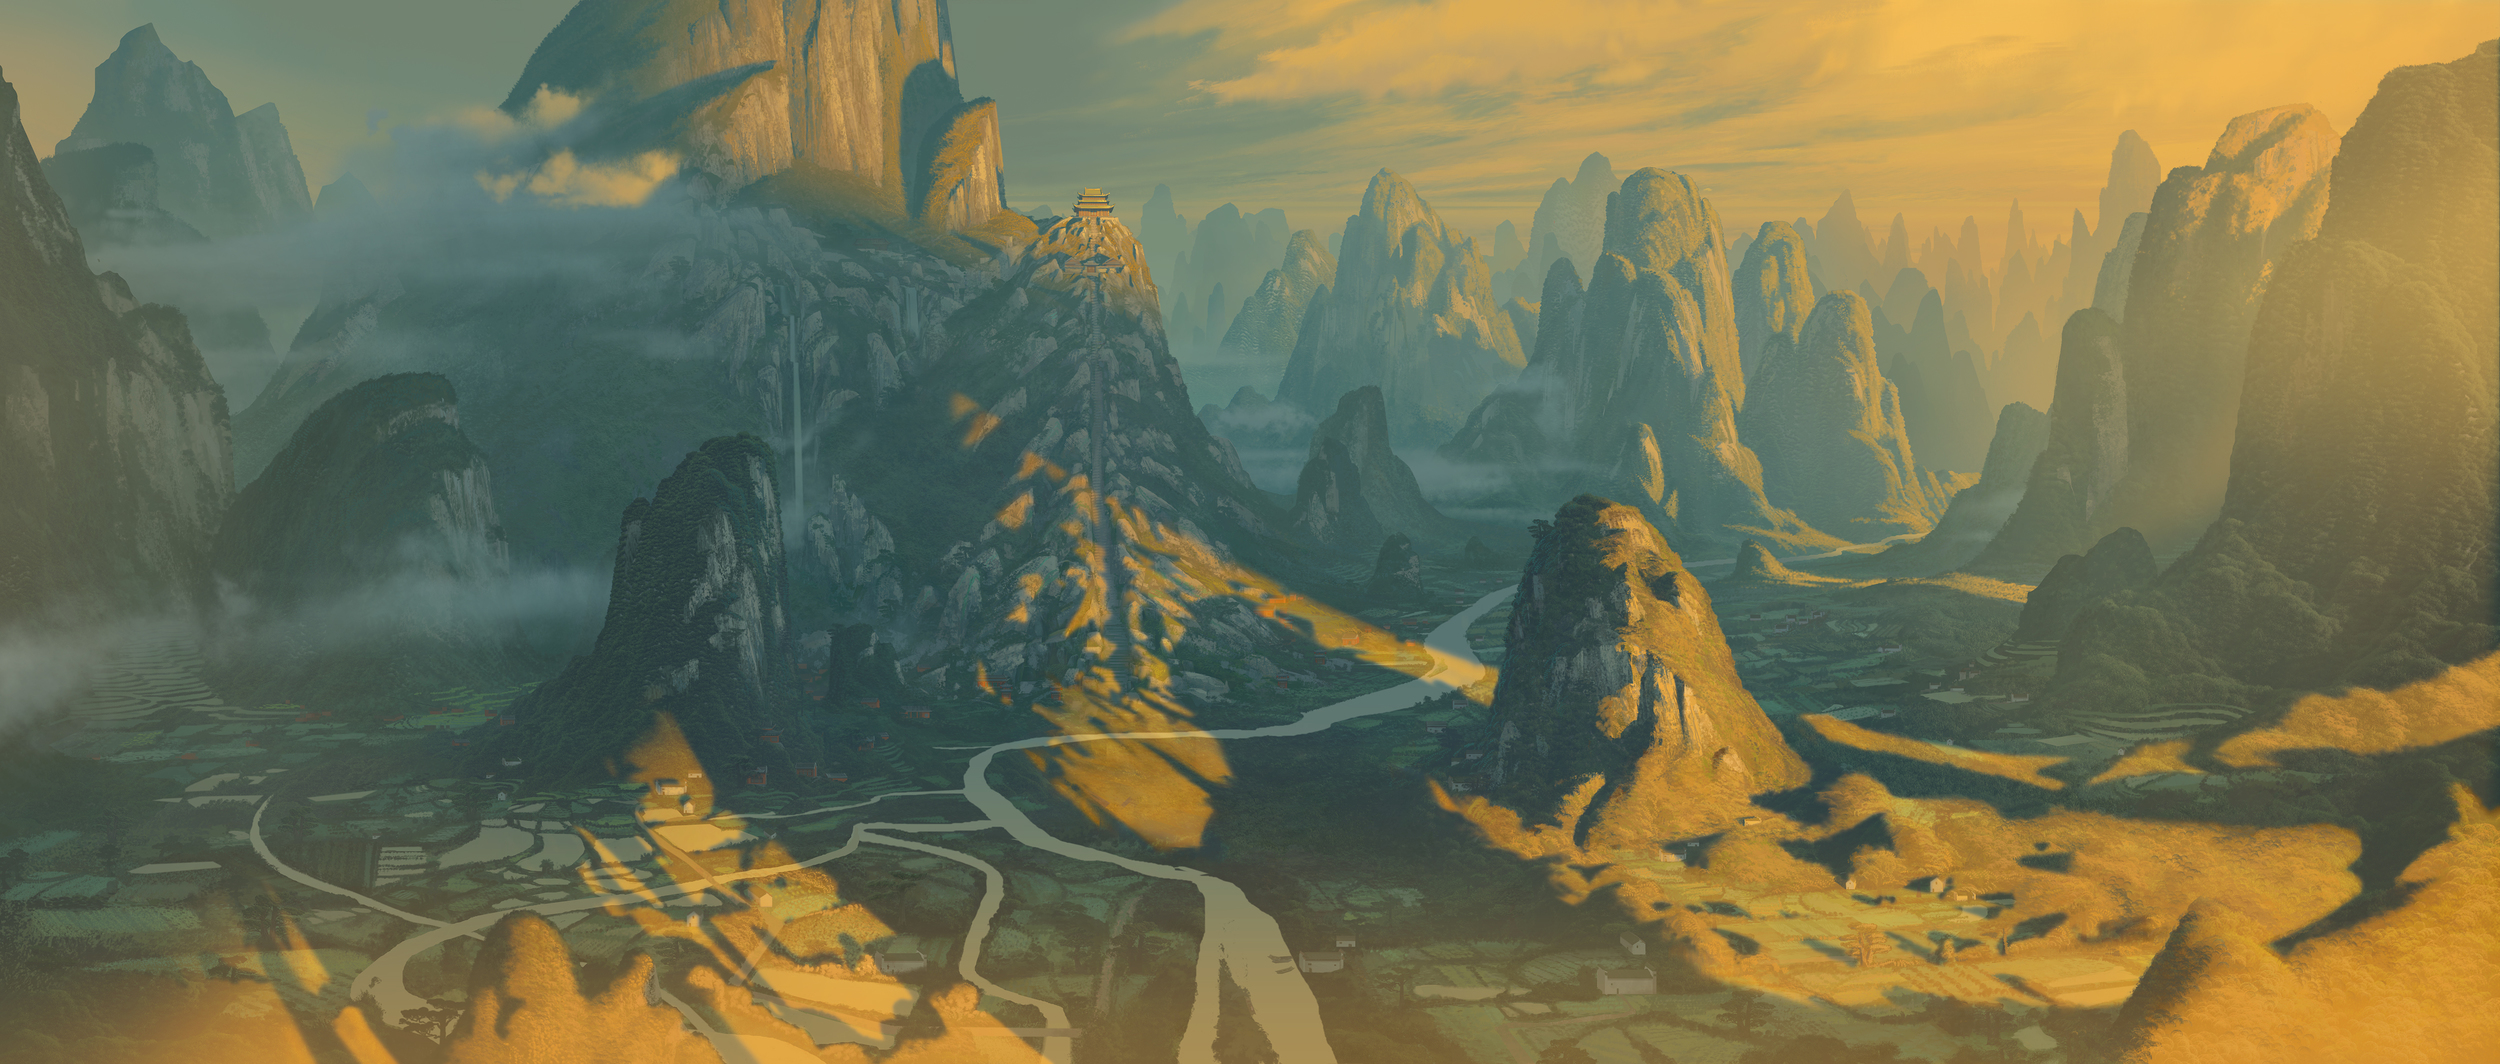 Kung Fu Panda, DWA Valley of Peace - Matte painting